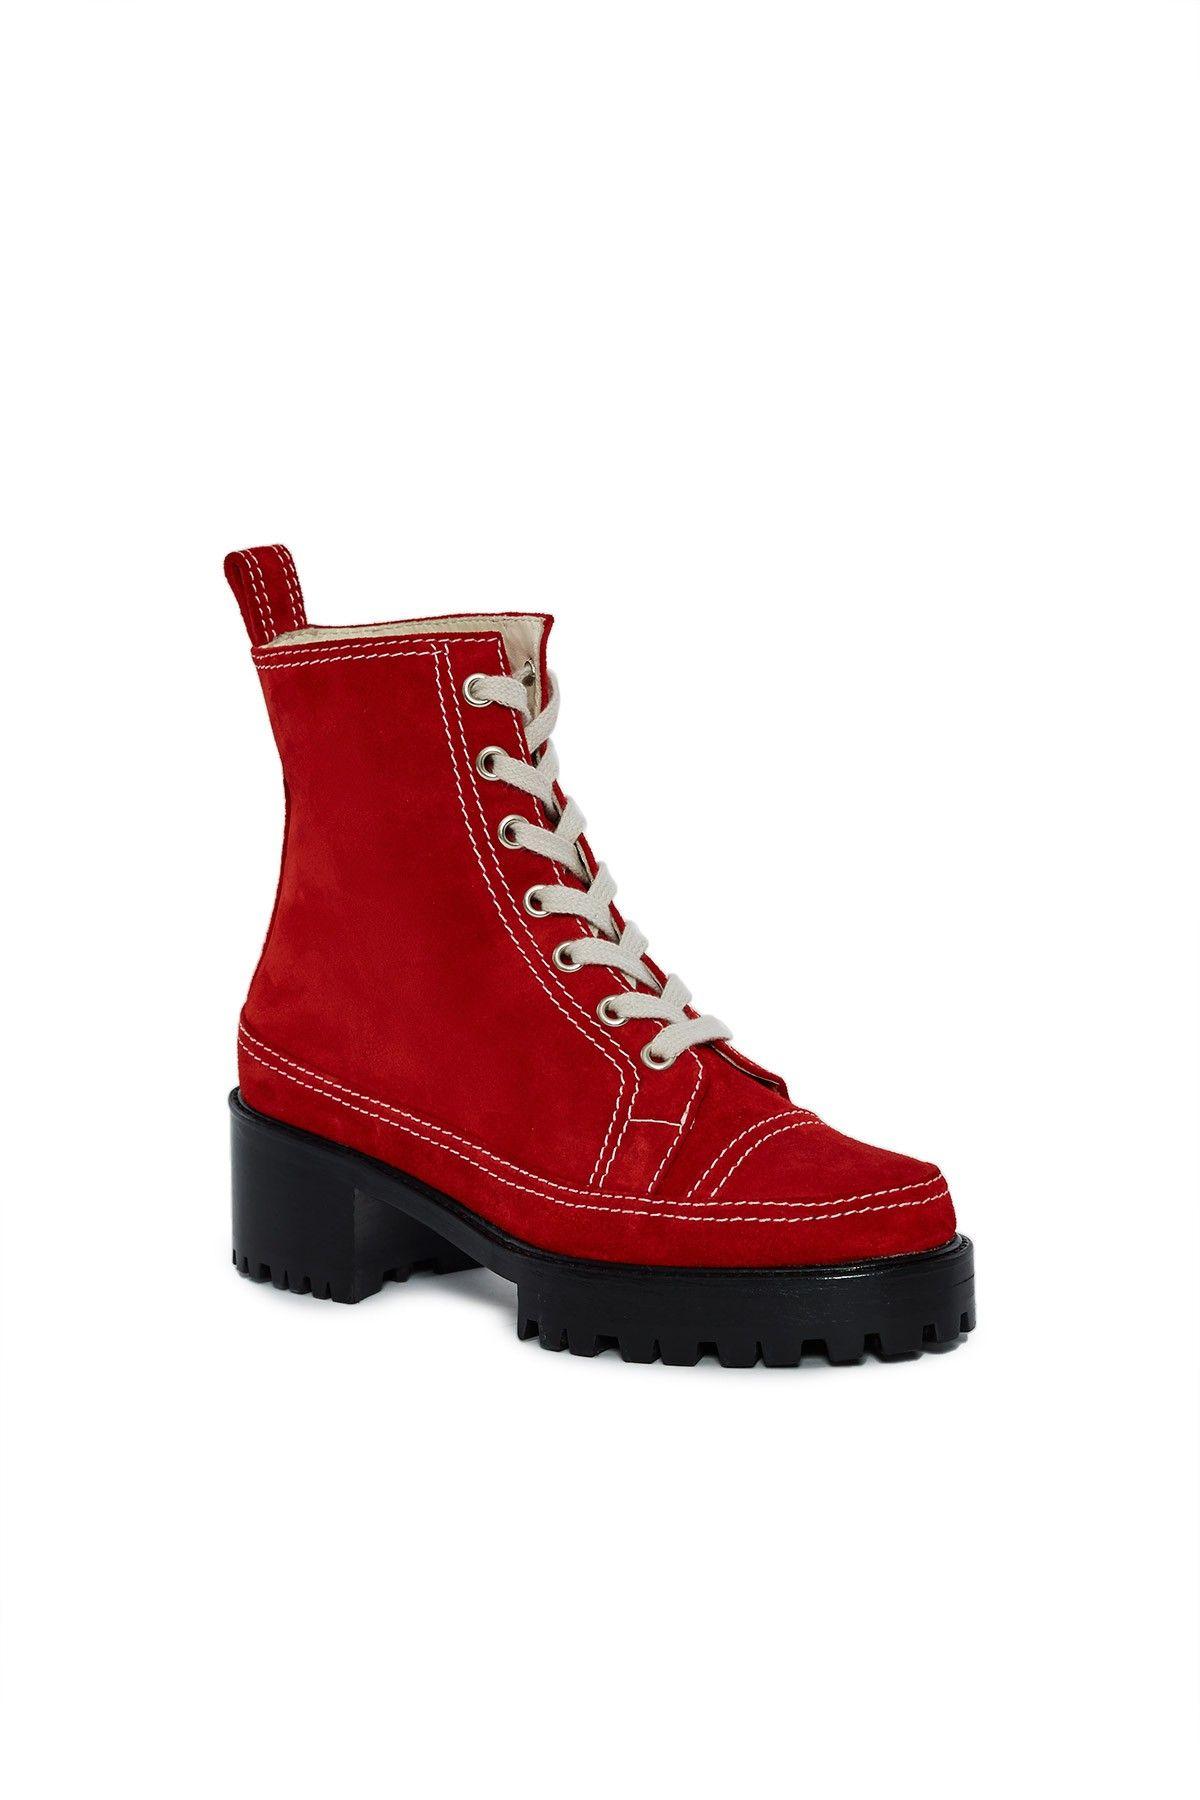 Nicole Saldan? Chris 2.0 boots Sr89Z